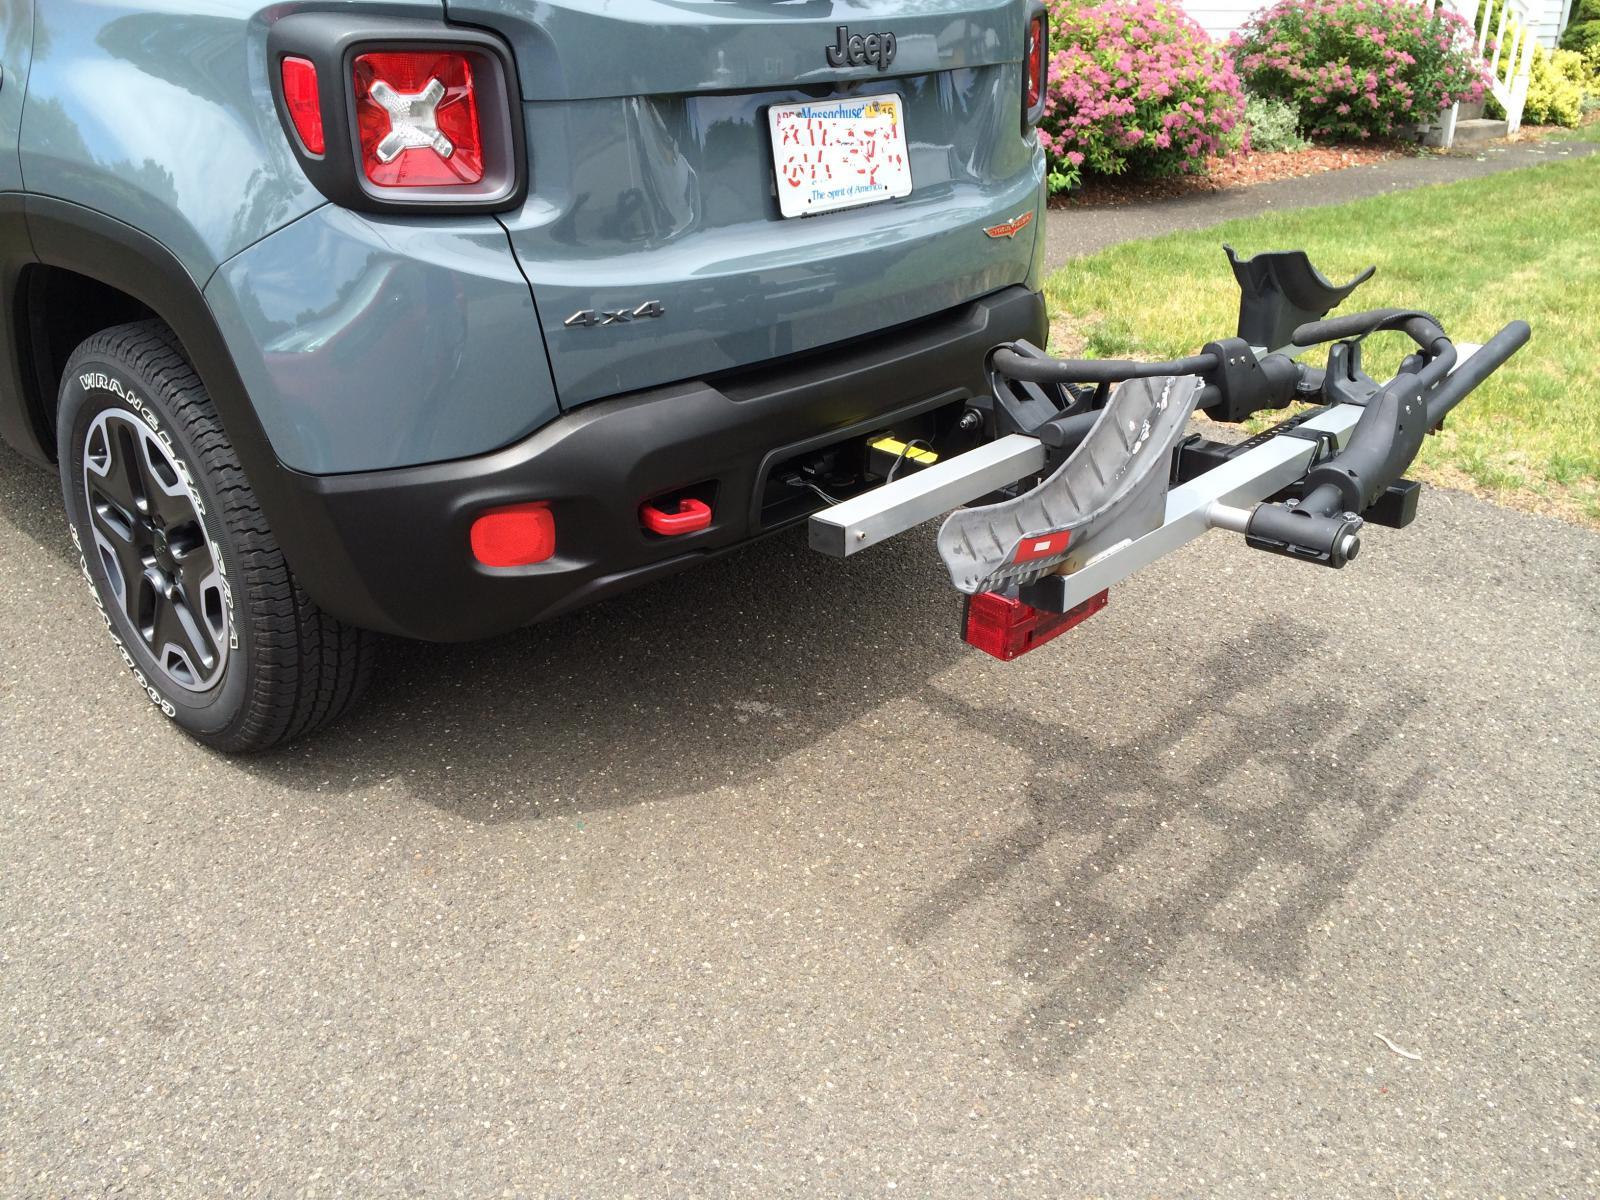 Bike Rack For Jeep Renegade >> Hitch Bike Rack Jeep Renegade Forum